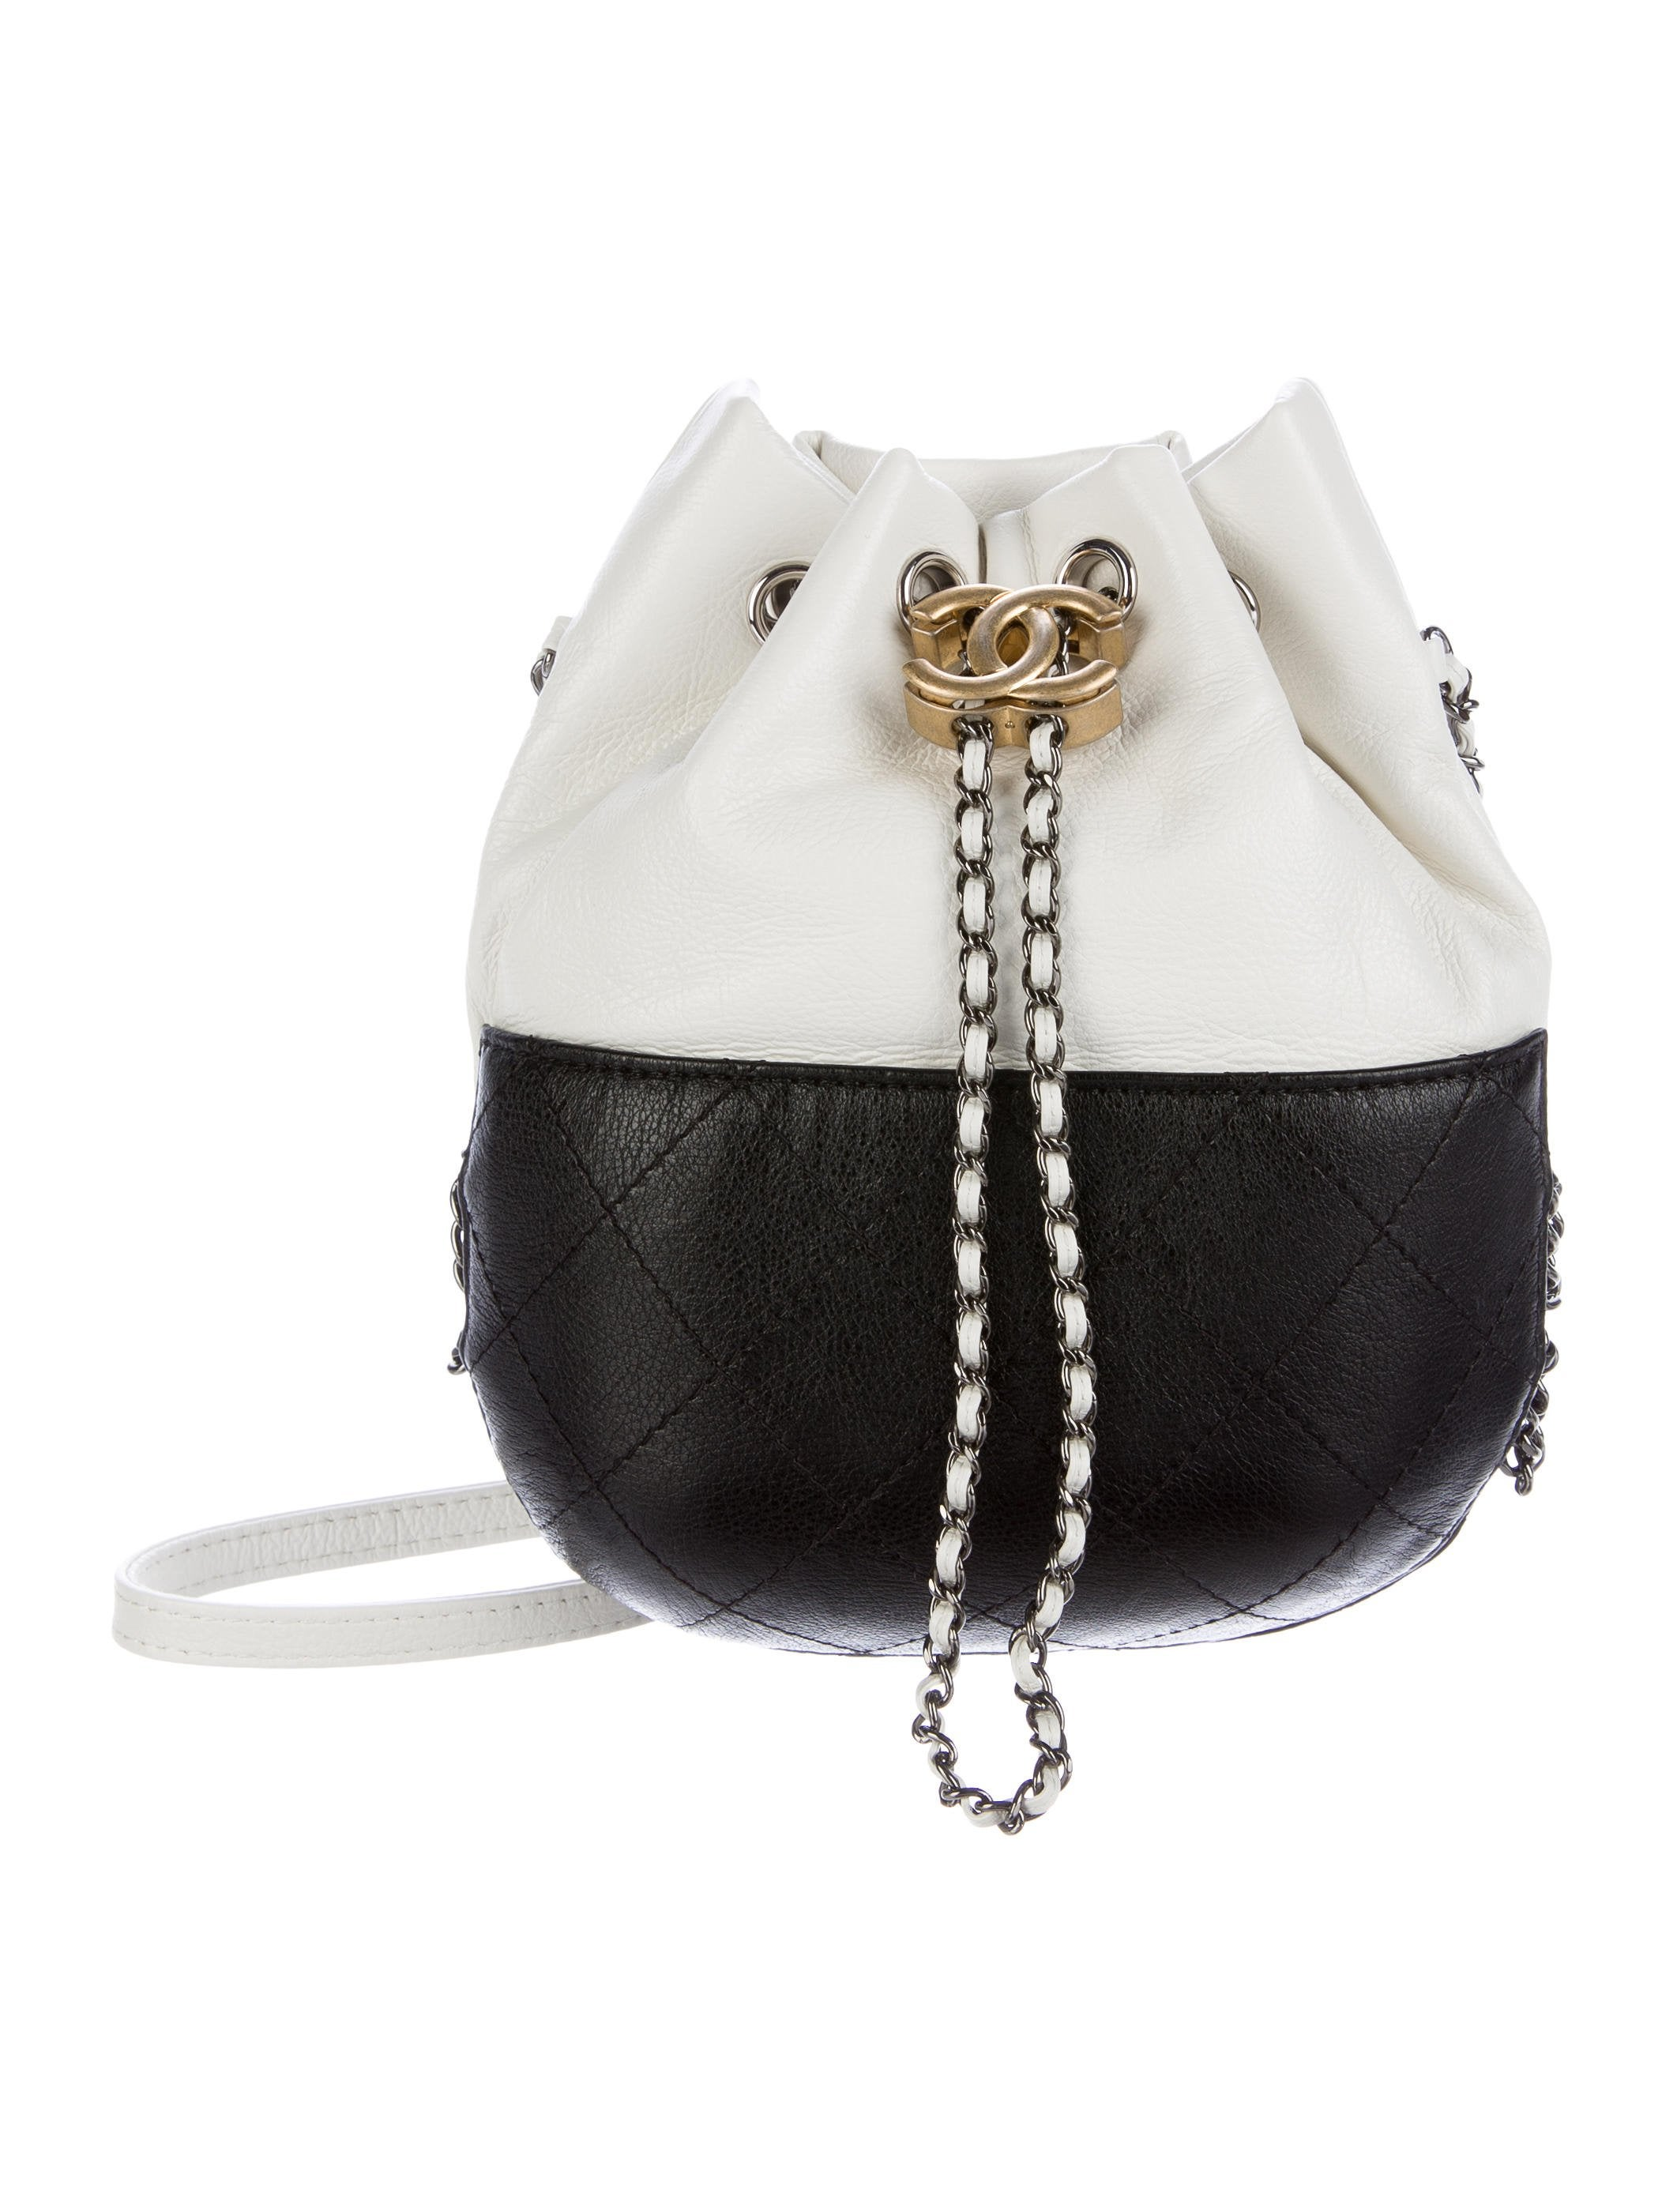 39adafa78597 Chanel 2017 Calfskin Gabrielle Bucket Bag - Handbags - CHA184363 ...